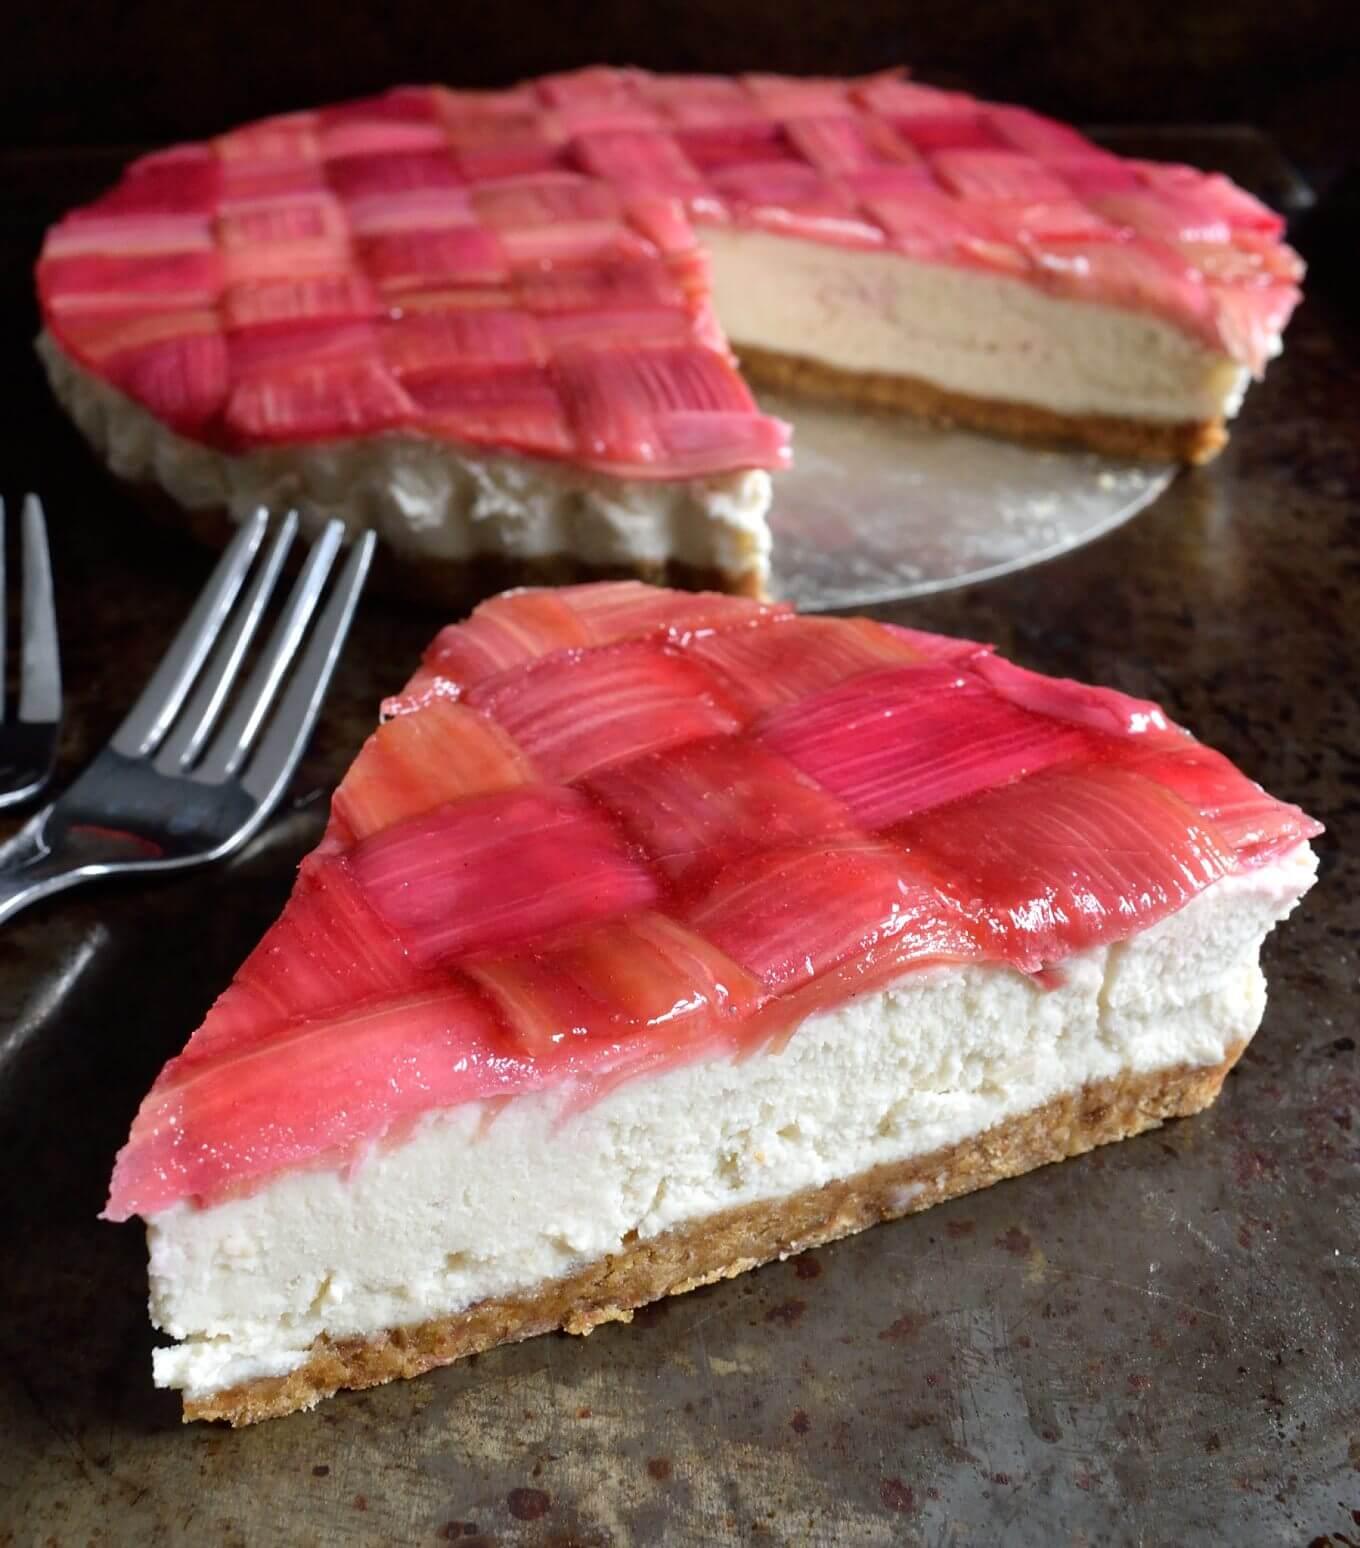 Vegan Rhubarb Cheesecake